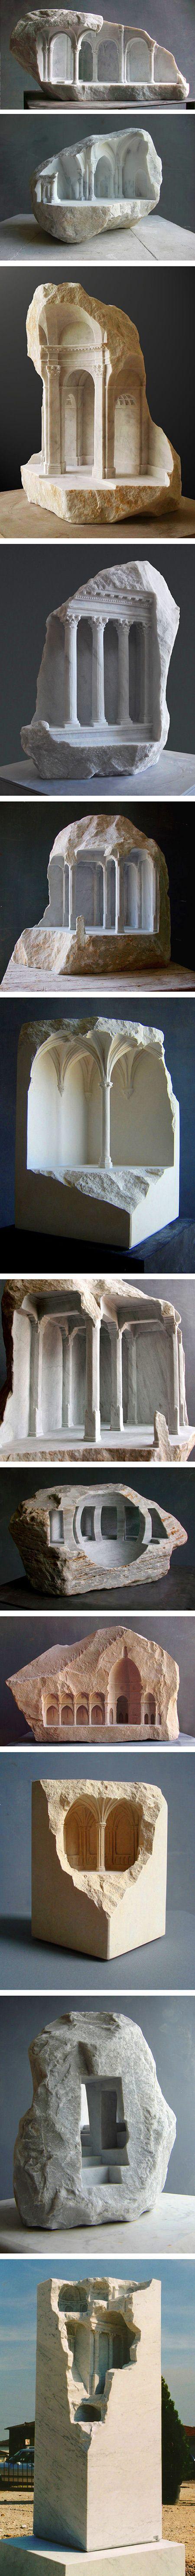 Matthew Simmonds, ... on ArtStack #matthew-simmonds #art Esculturas en piedra de columnas y espacios arquitectónicos